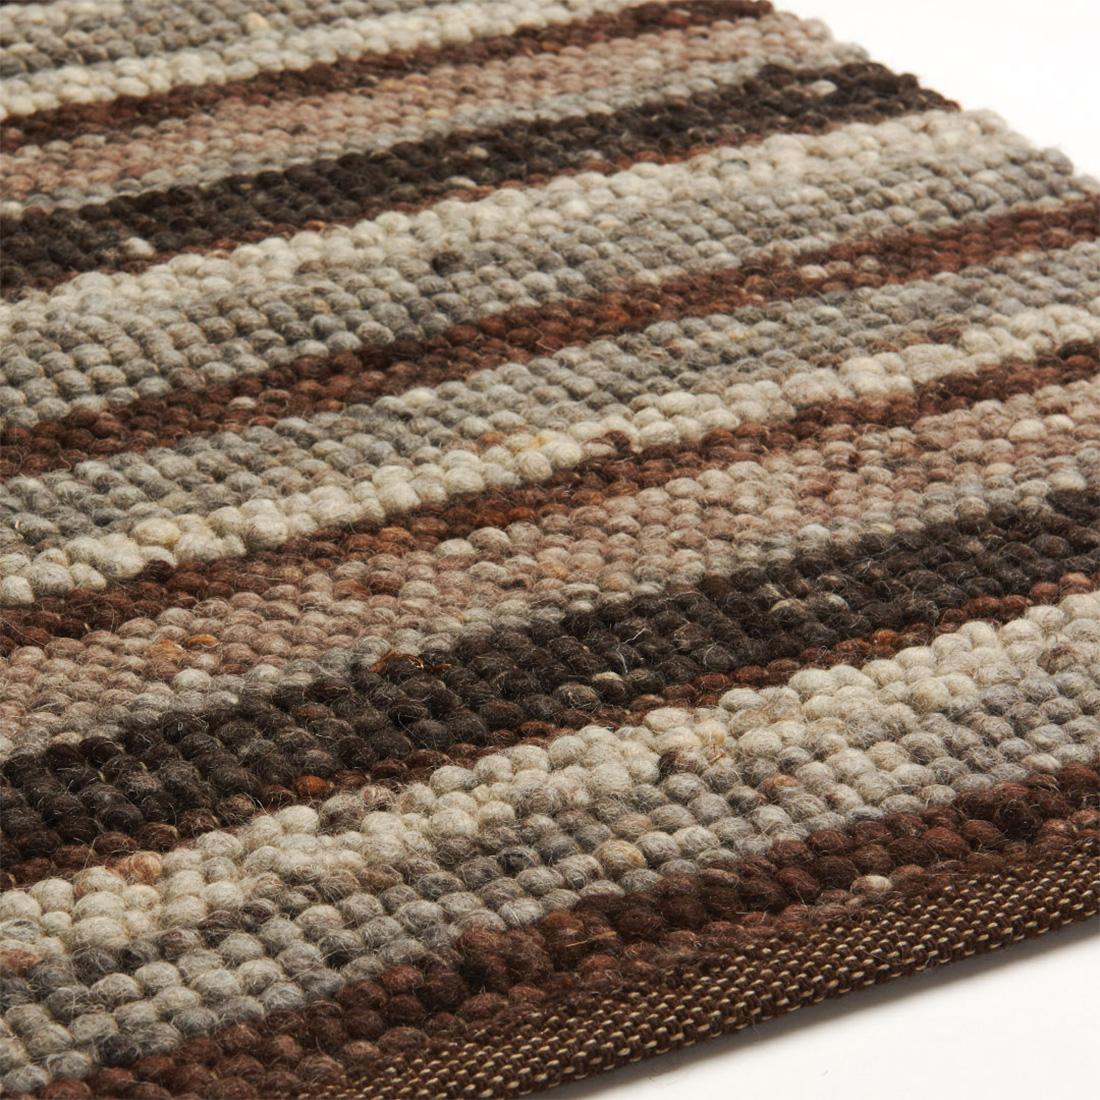 Vloerkleed Brinker Greenland Stripes 1042 | 170 x 230 cm